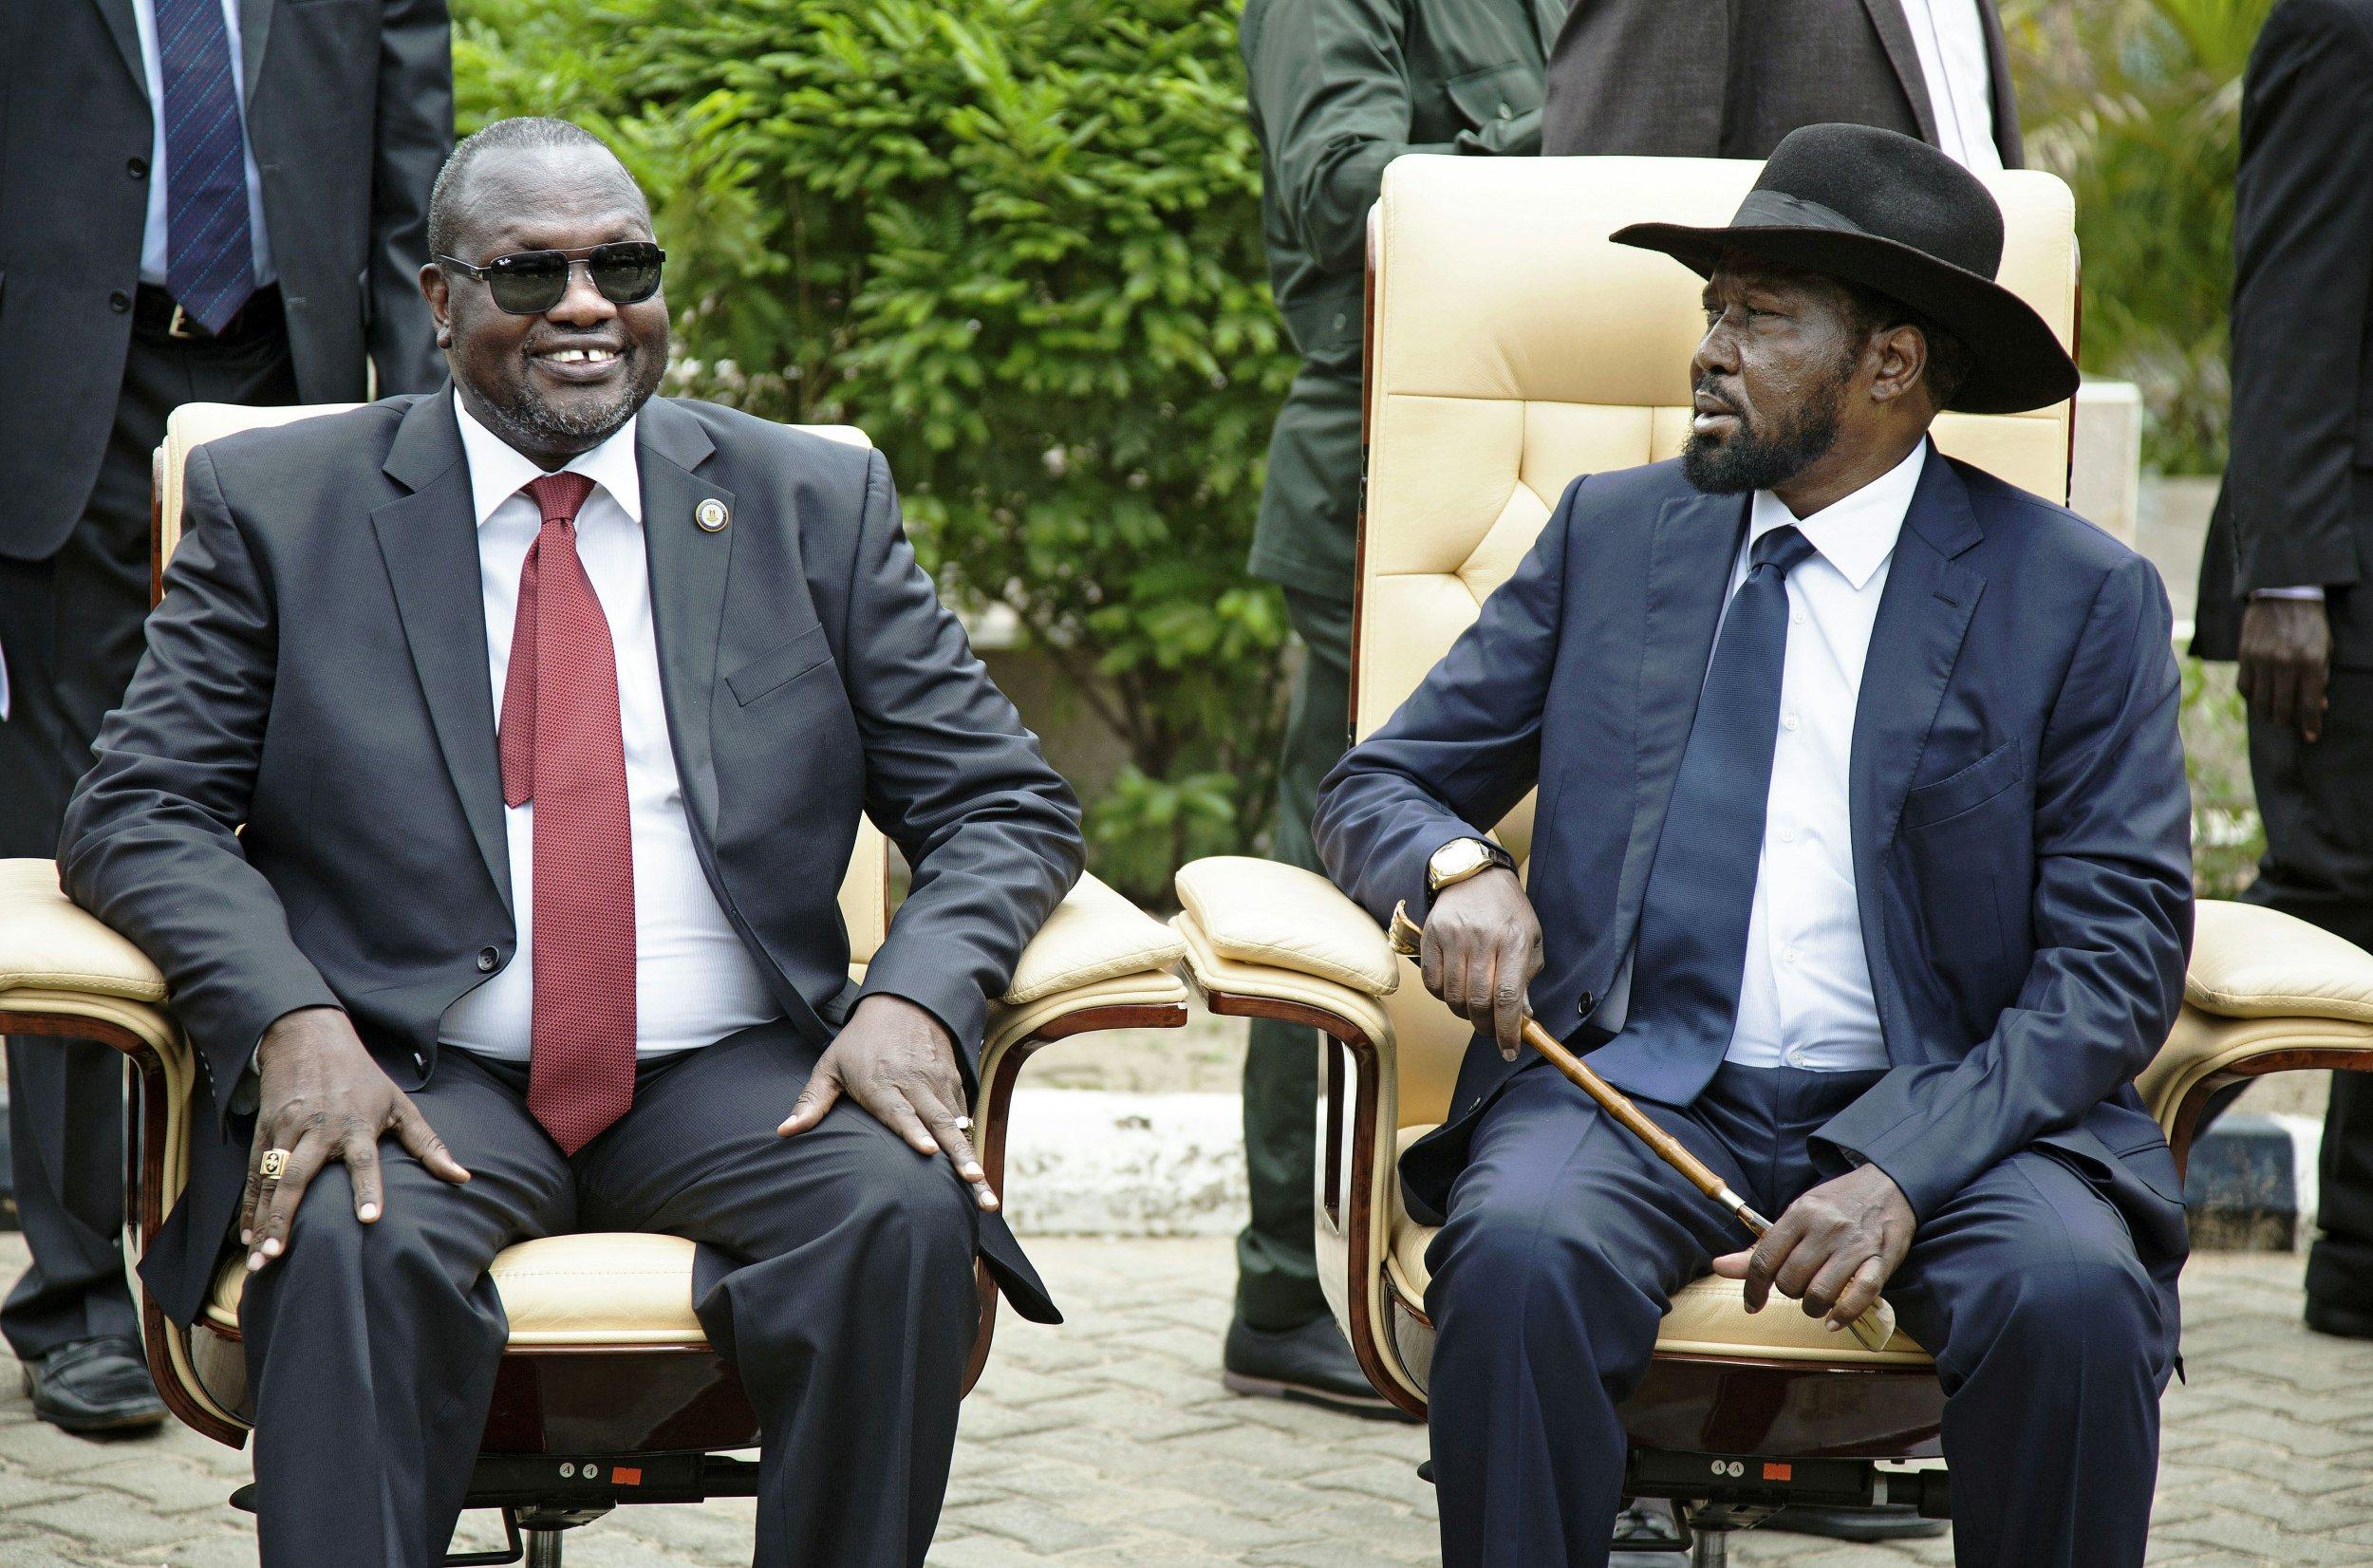 Salva Kiir and Riek Machar